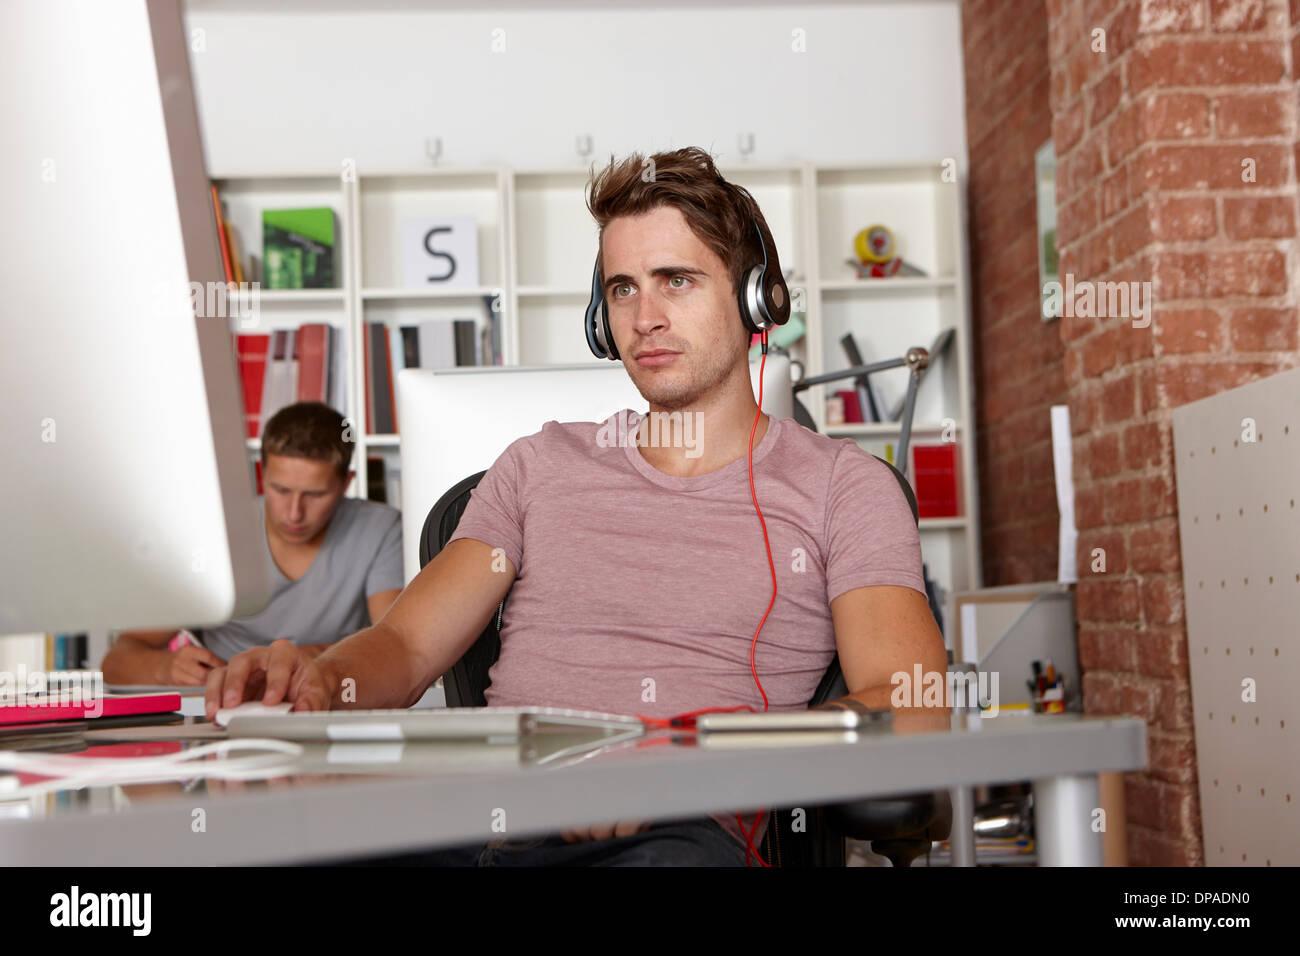 Young man at work wearing headphones - Stock Image